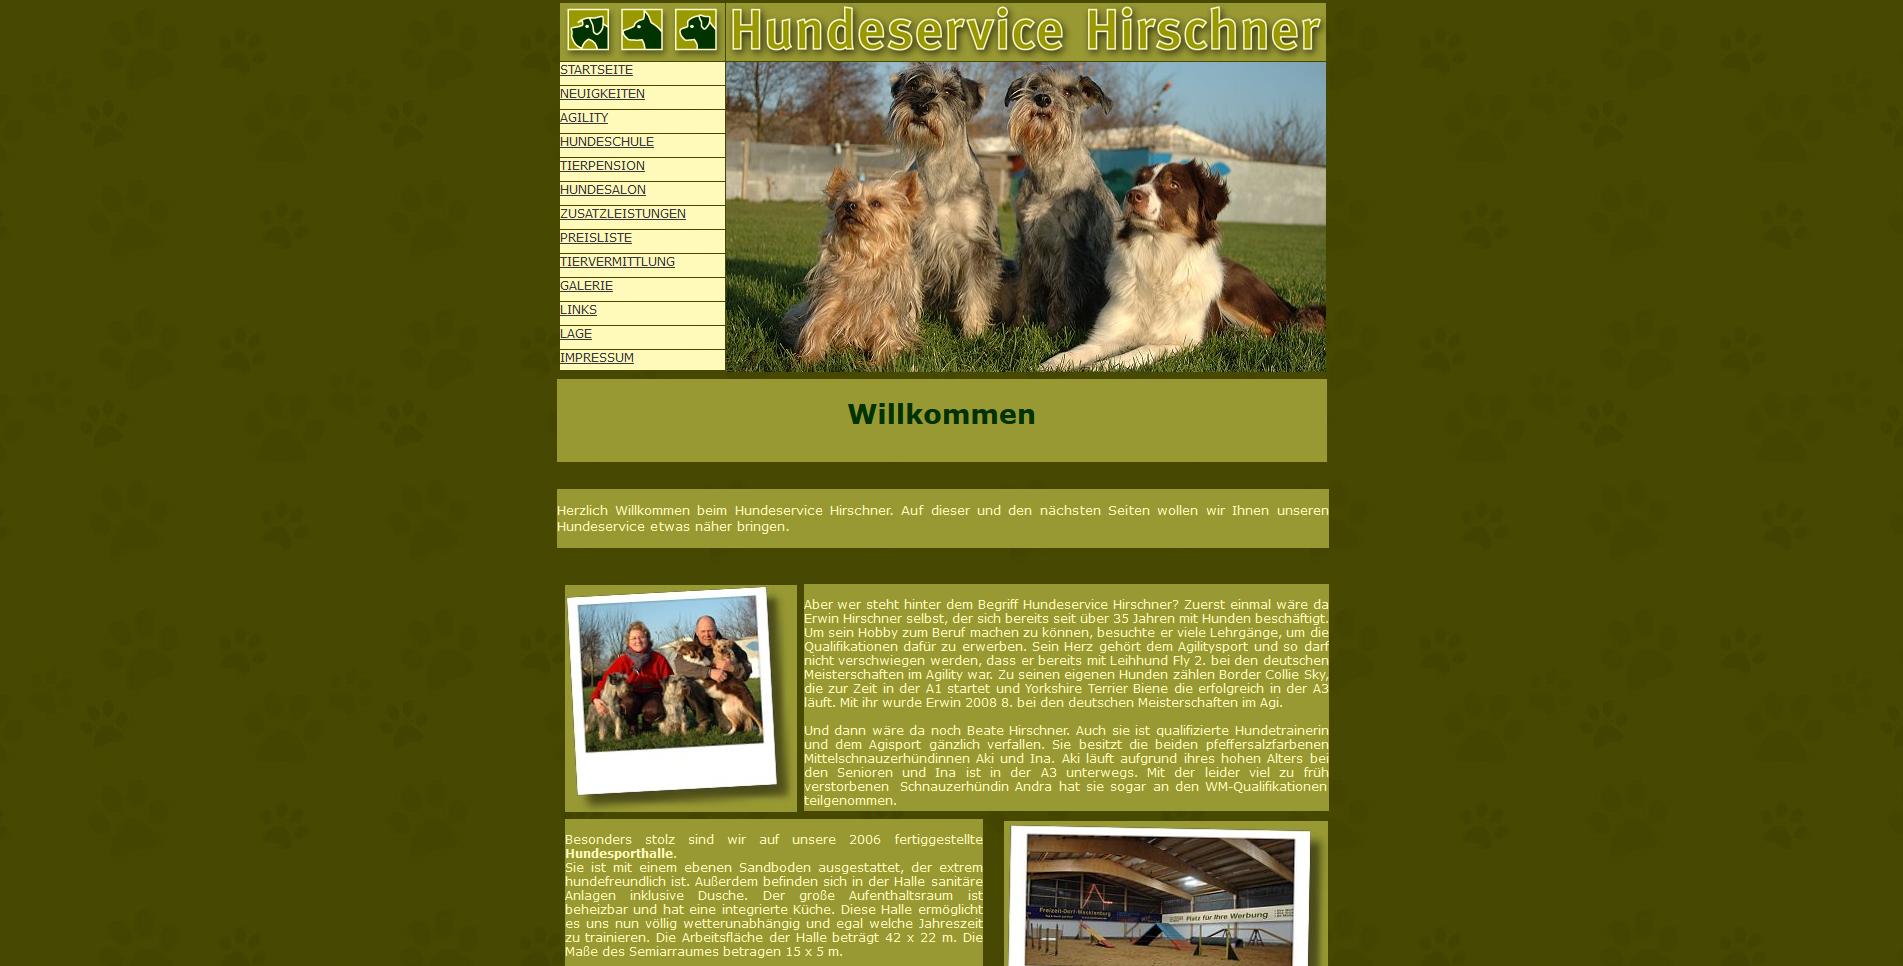 Hundeservice Hirschner